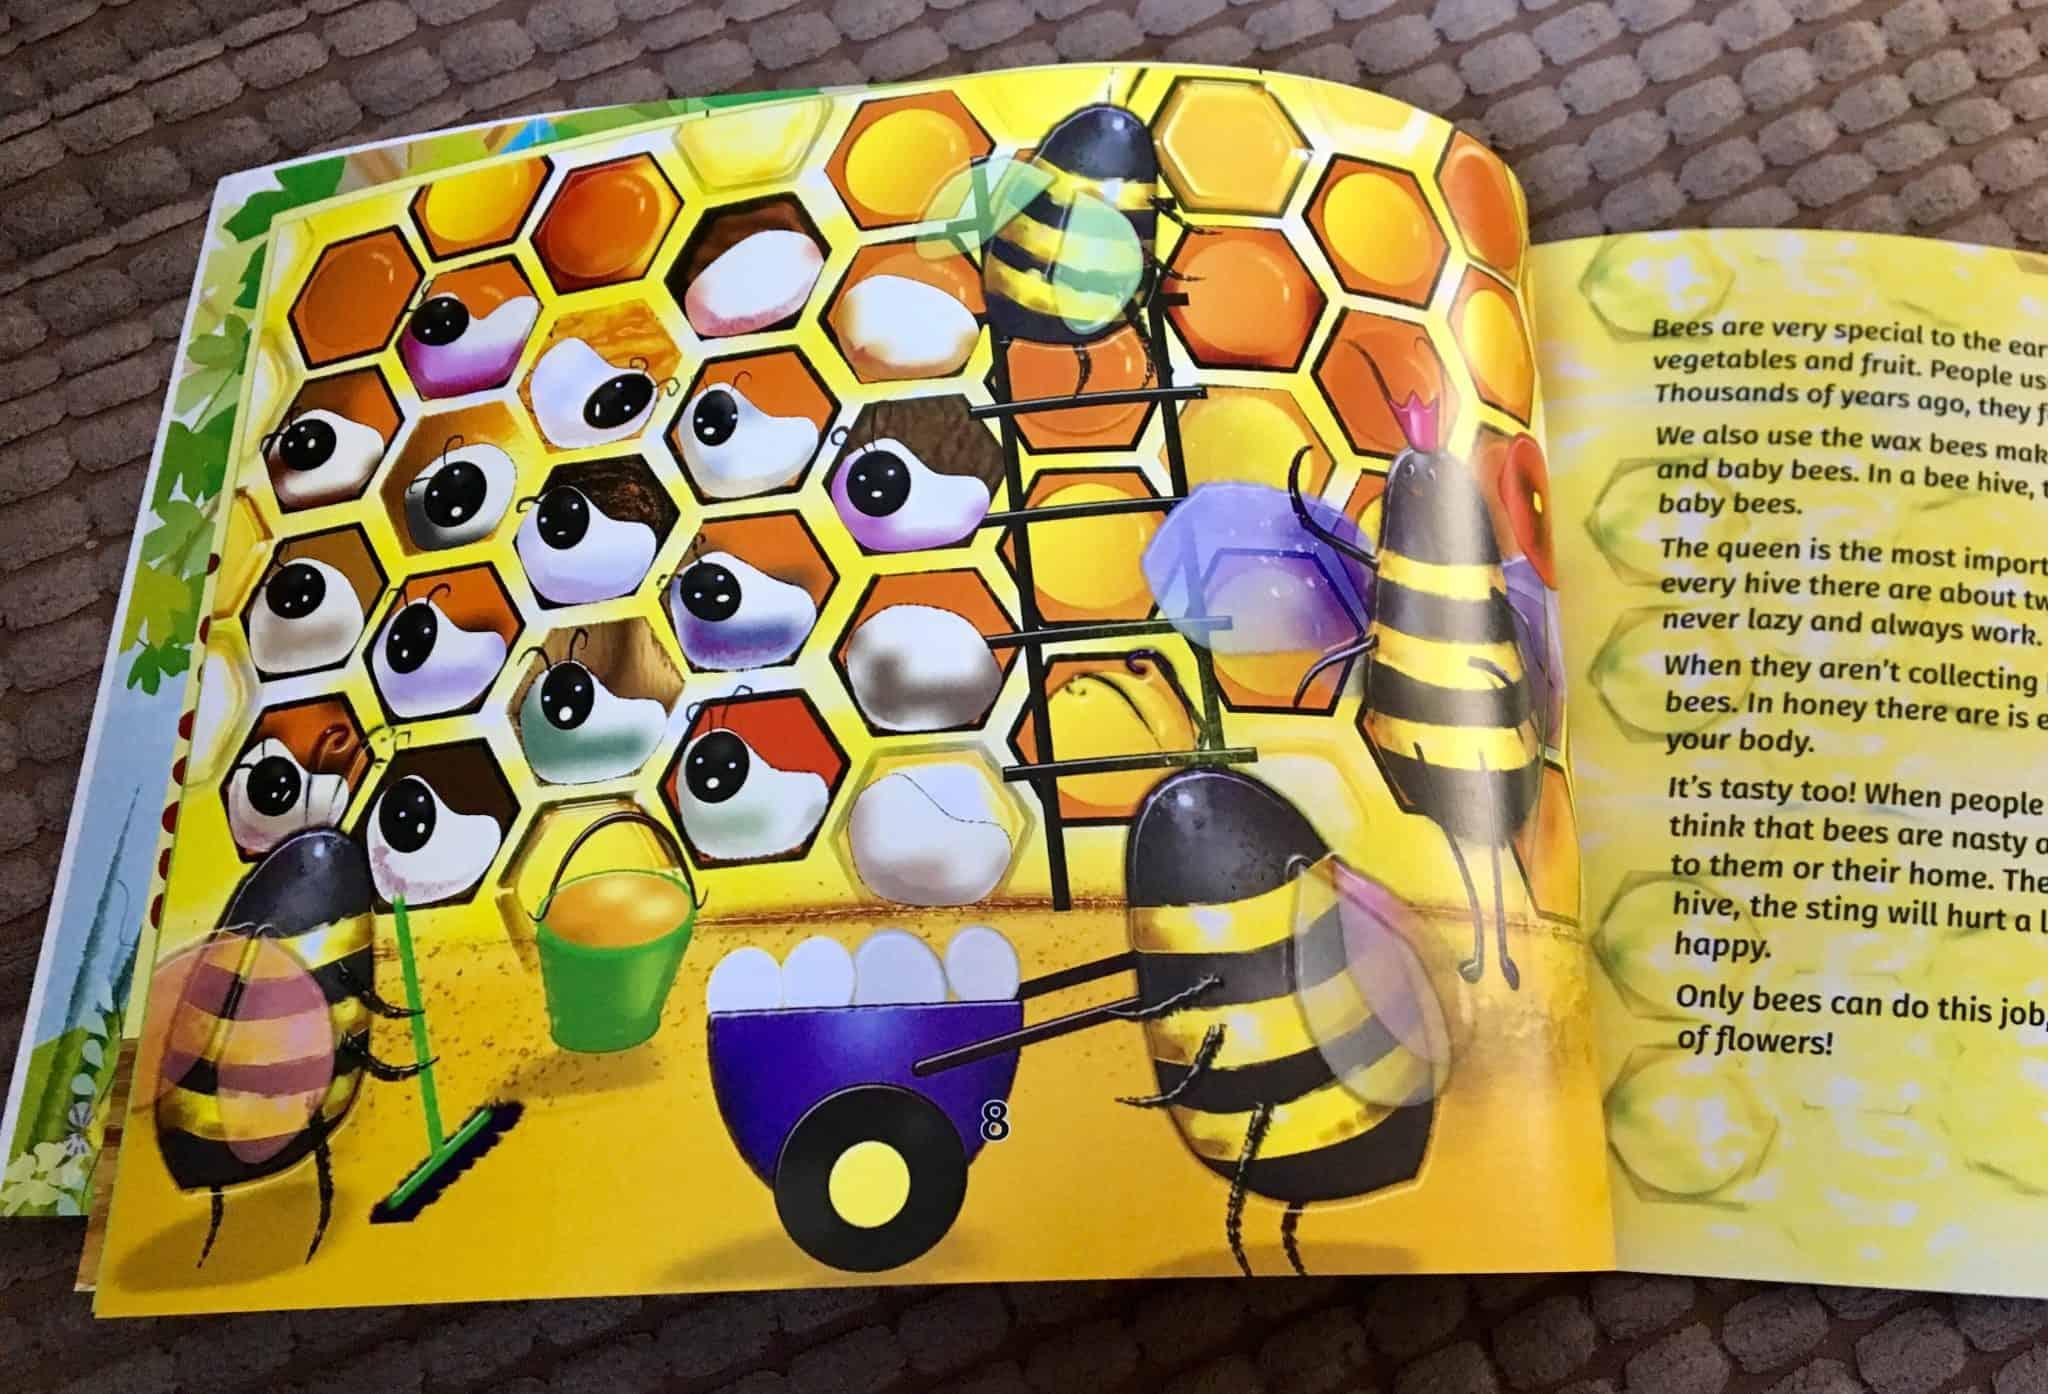 Wonderful illustrations in Curious Beekeeper Nina